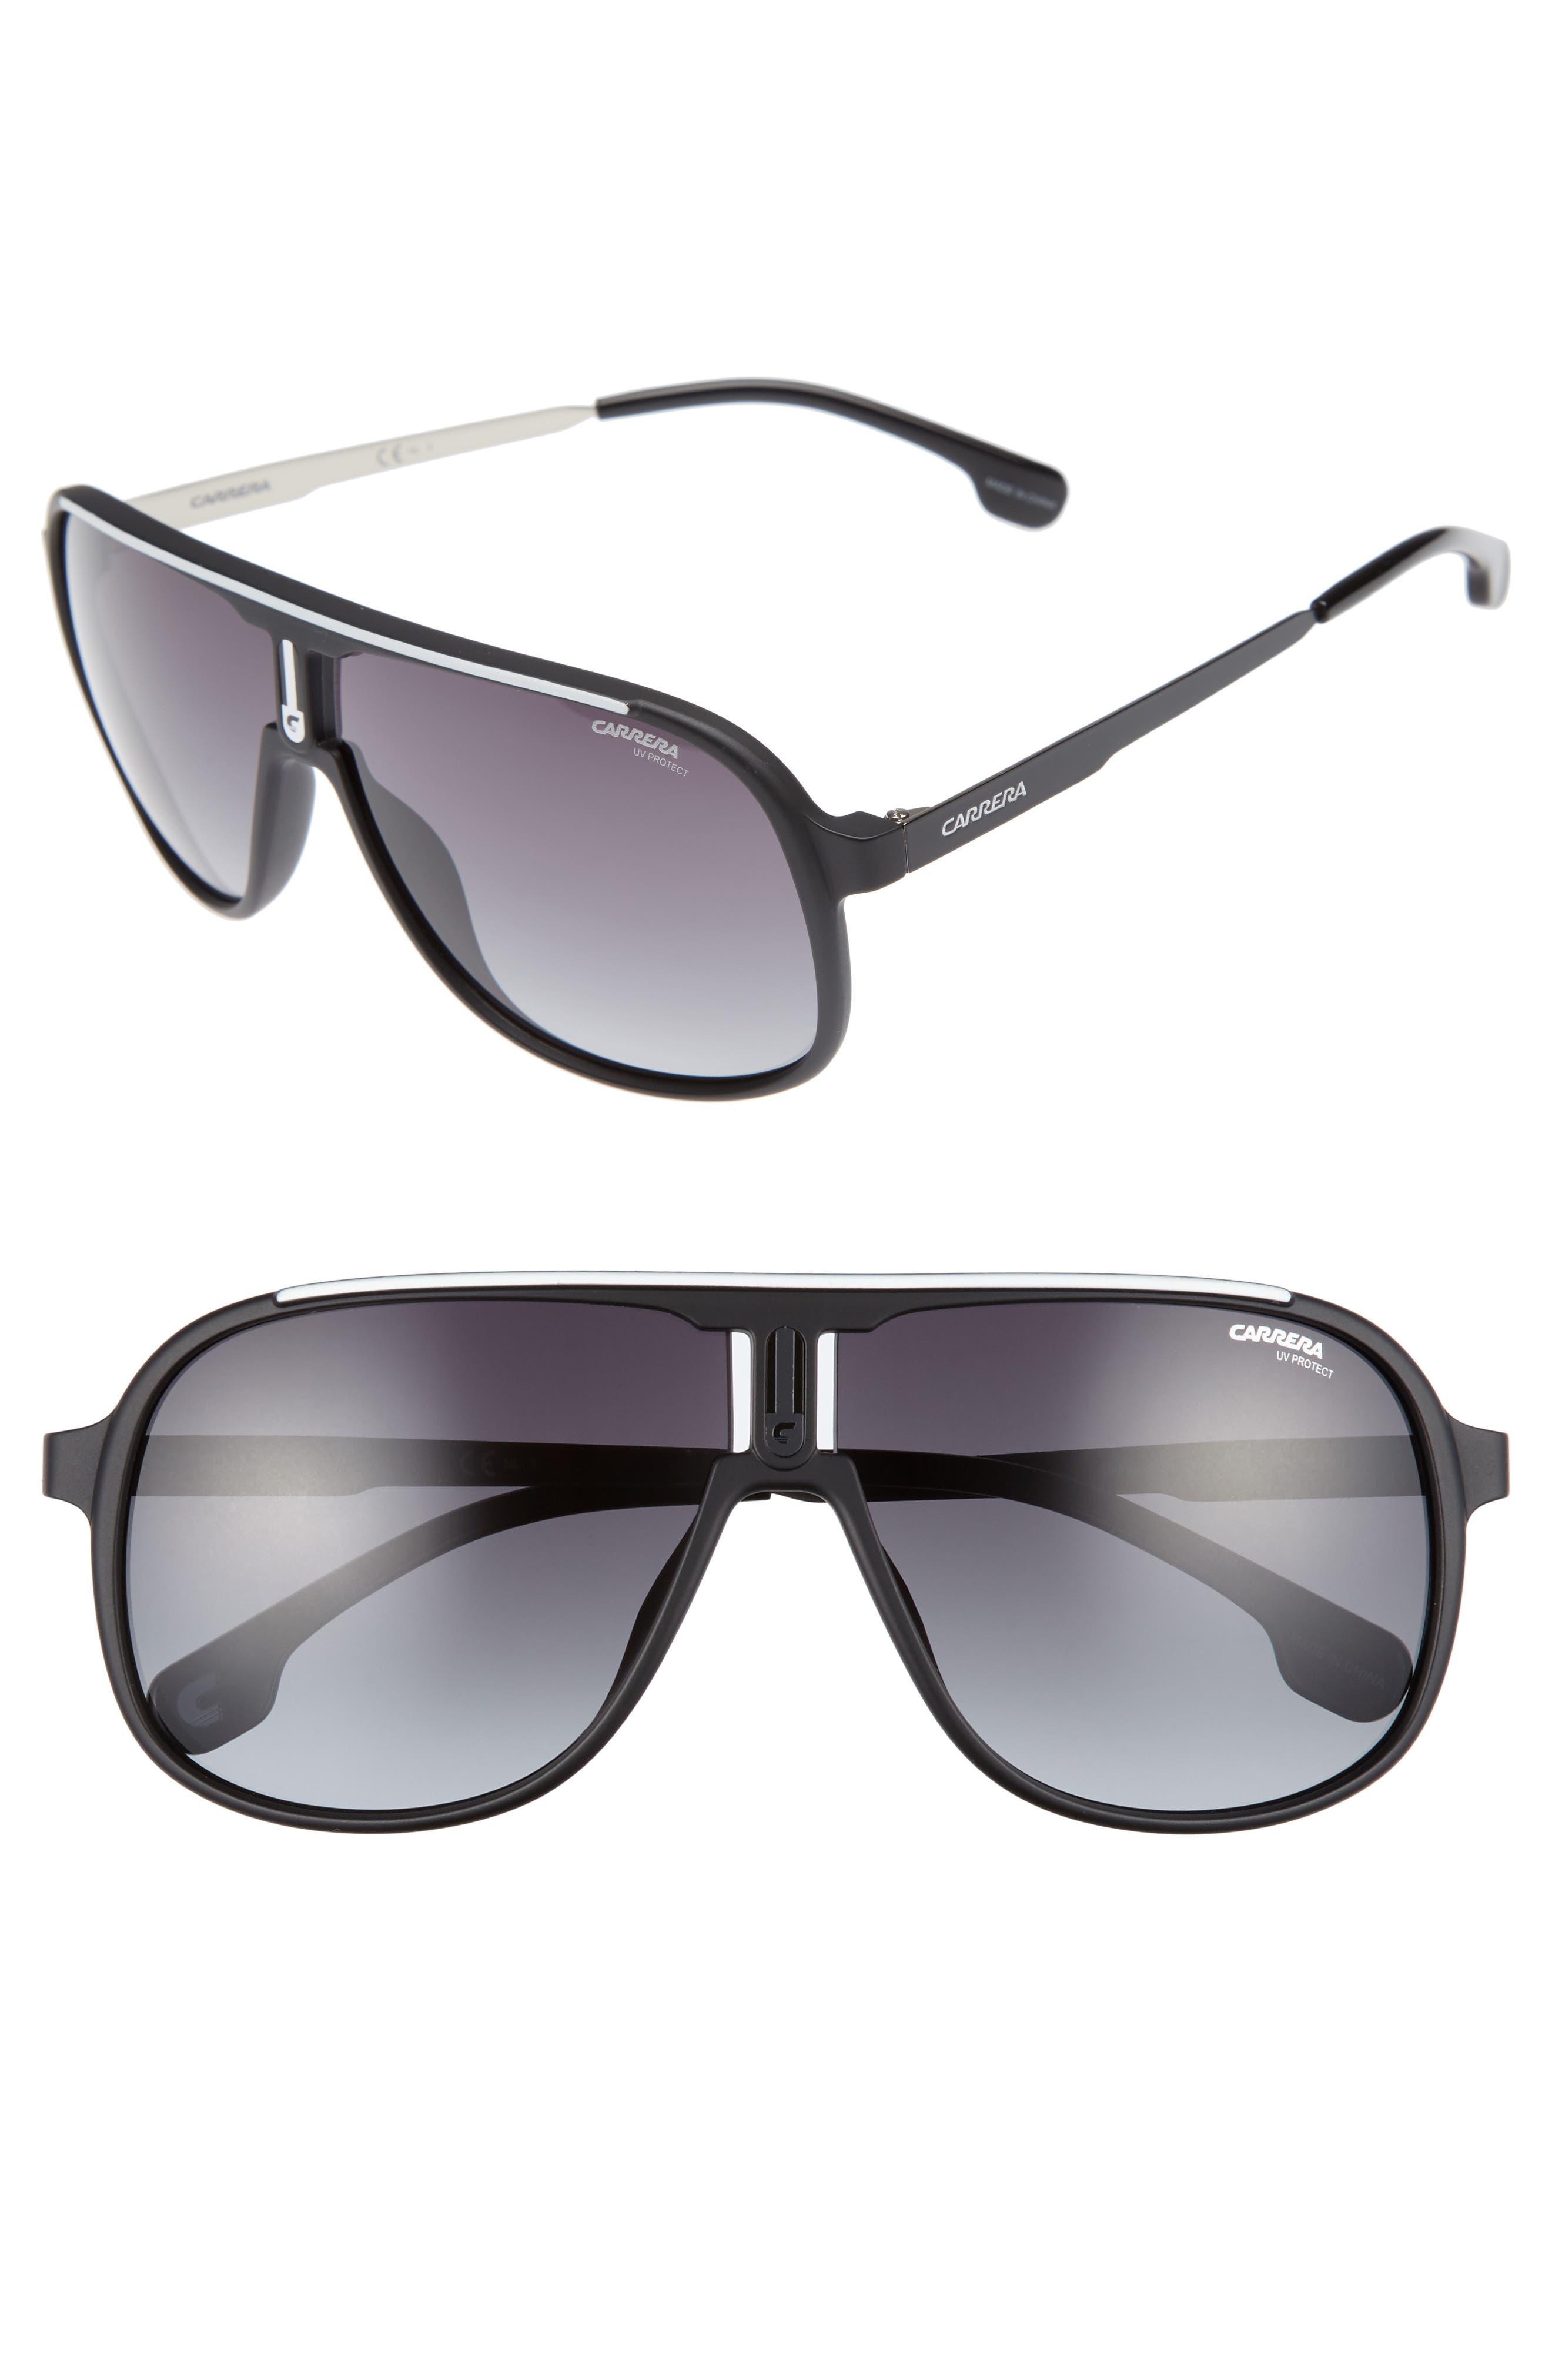 Carrera Eyewear 62Mm Sunglasses - Matte Black